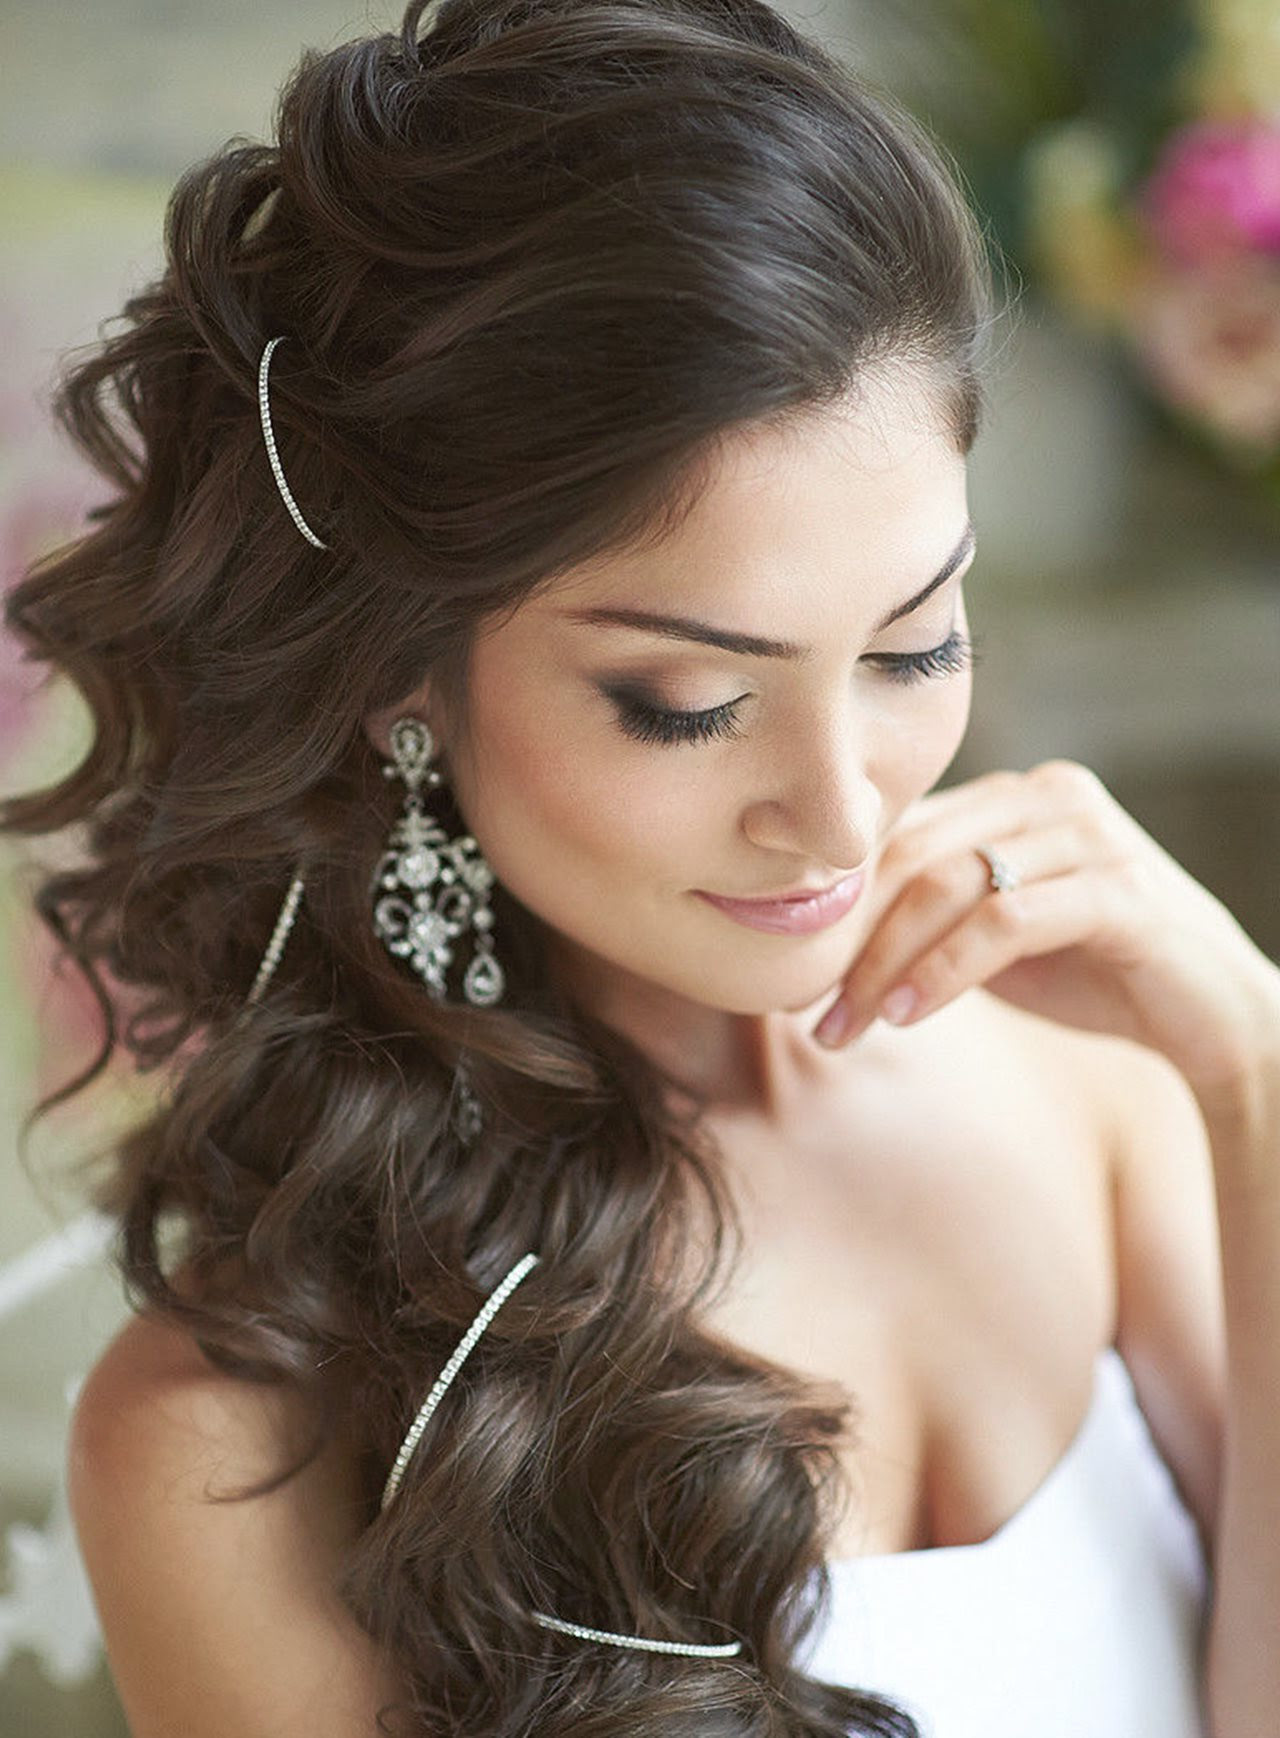 Beautiful Hairstyles For Long Hair Women's - The Xerxes